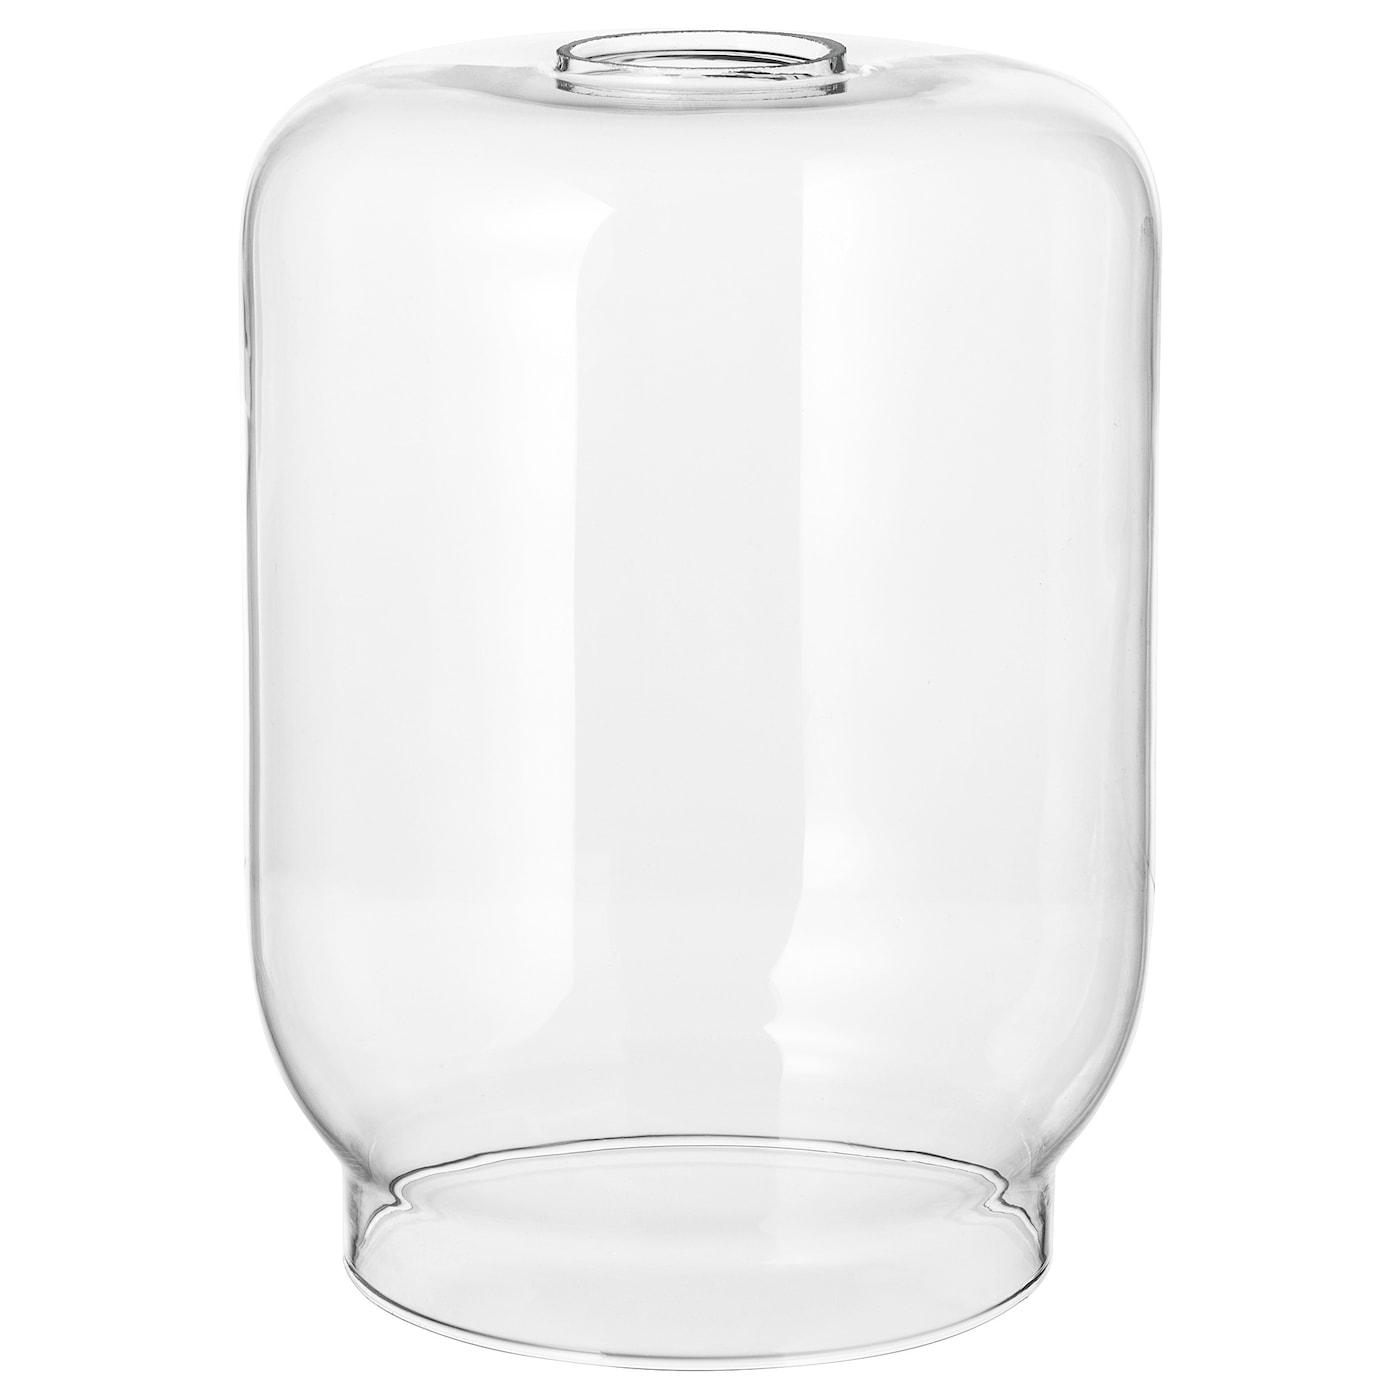 IKEA 203.940.96 Klovan Pendant Lamp Shade Clear Glass